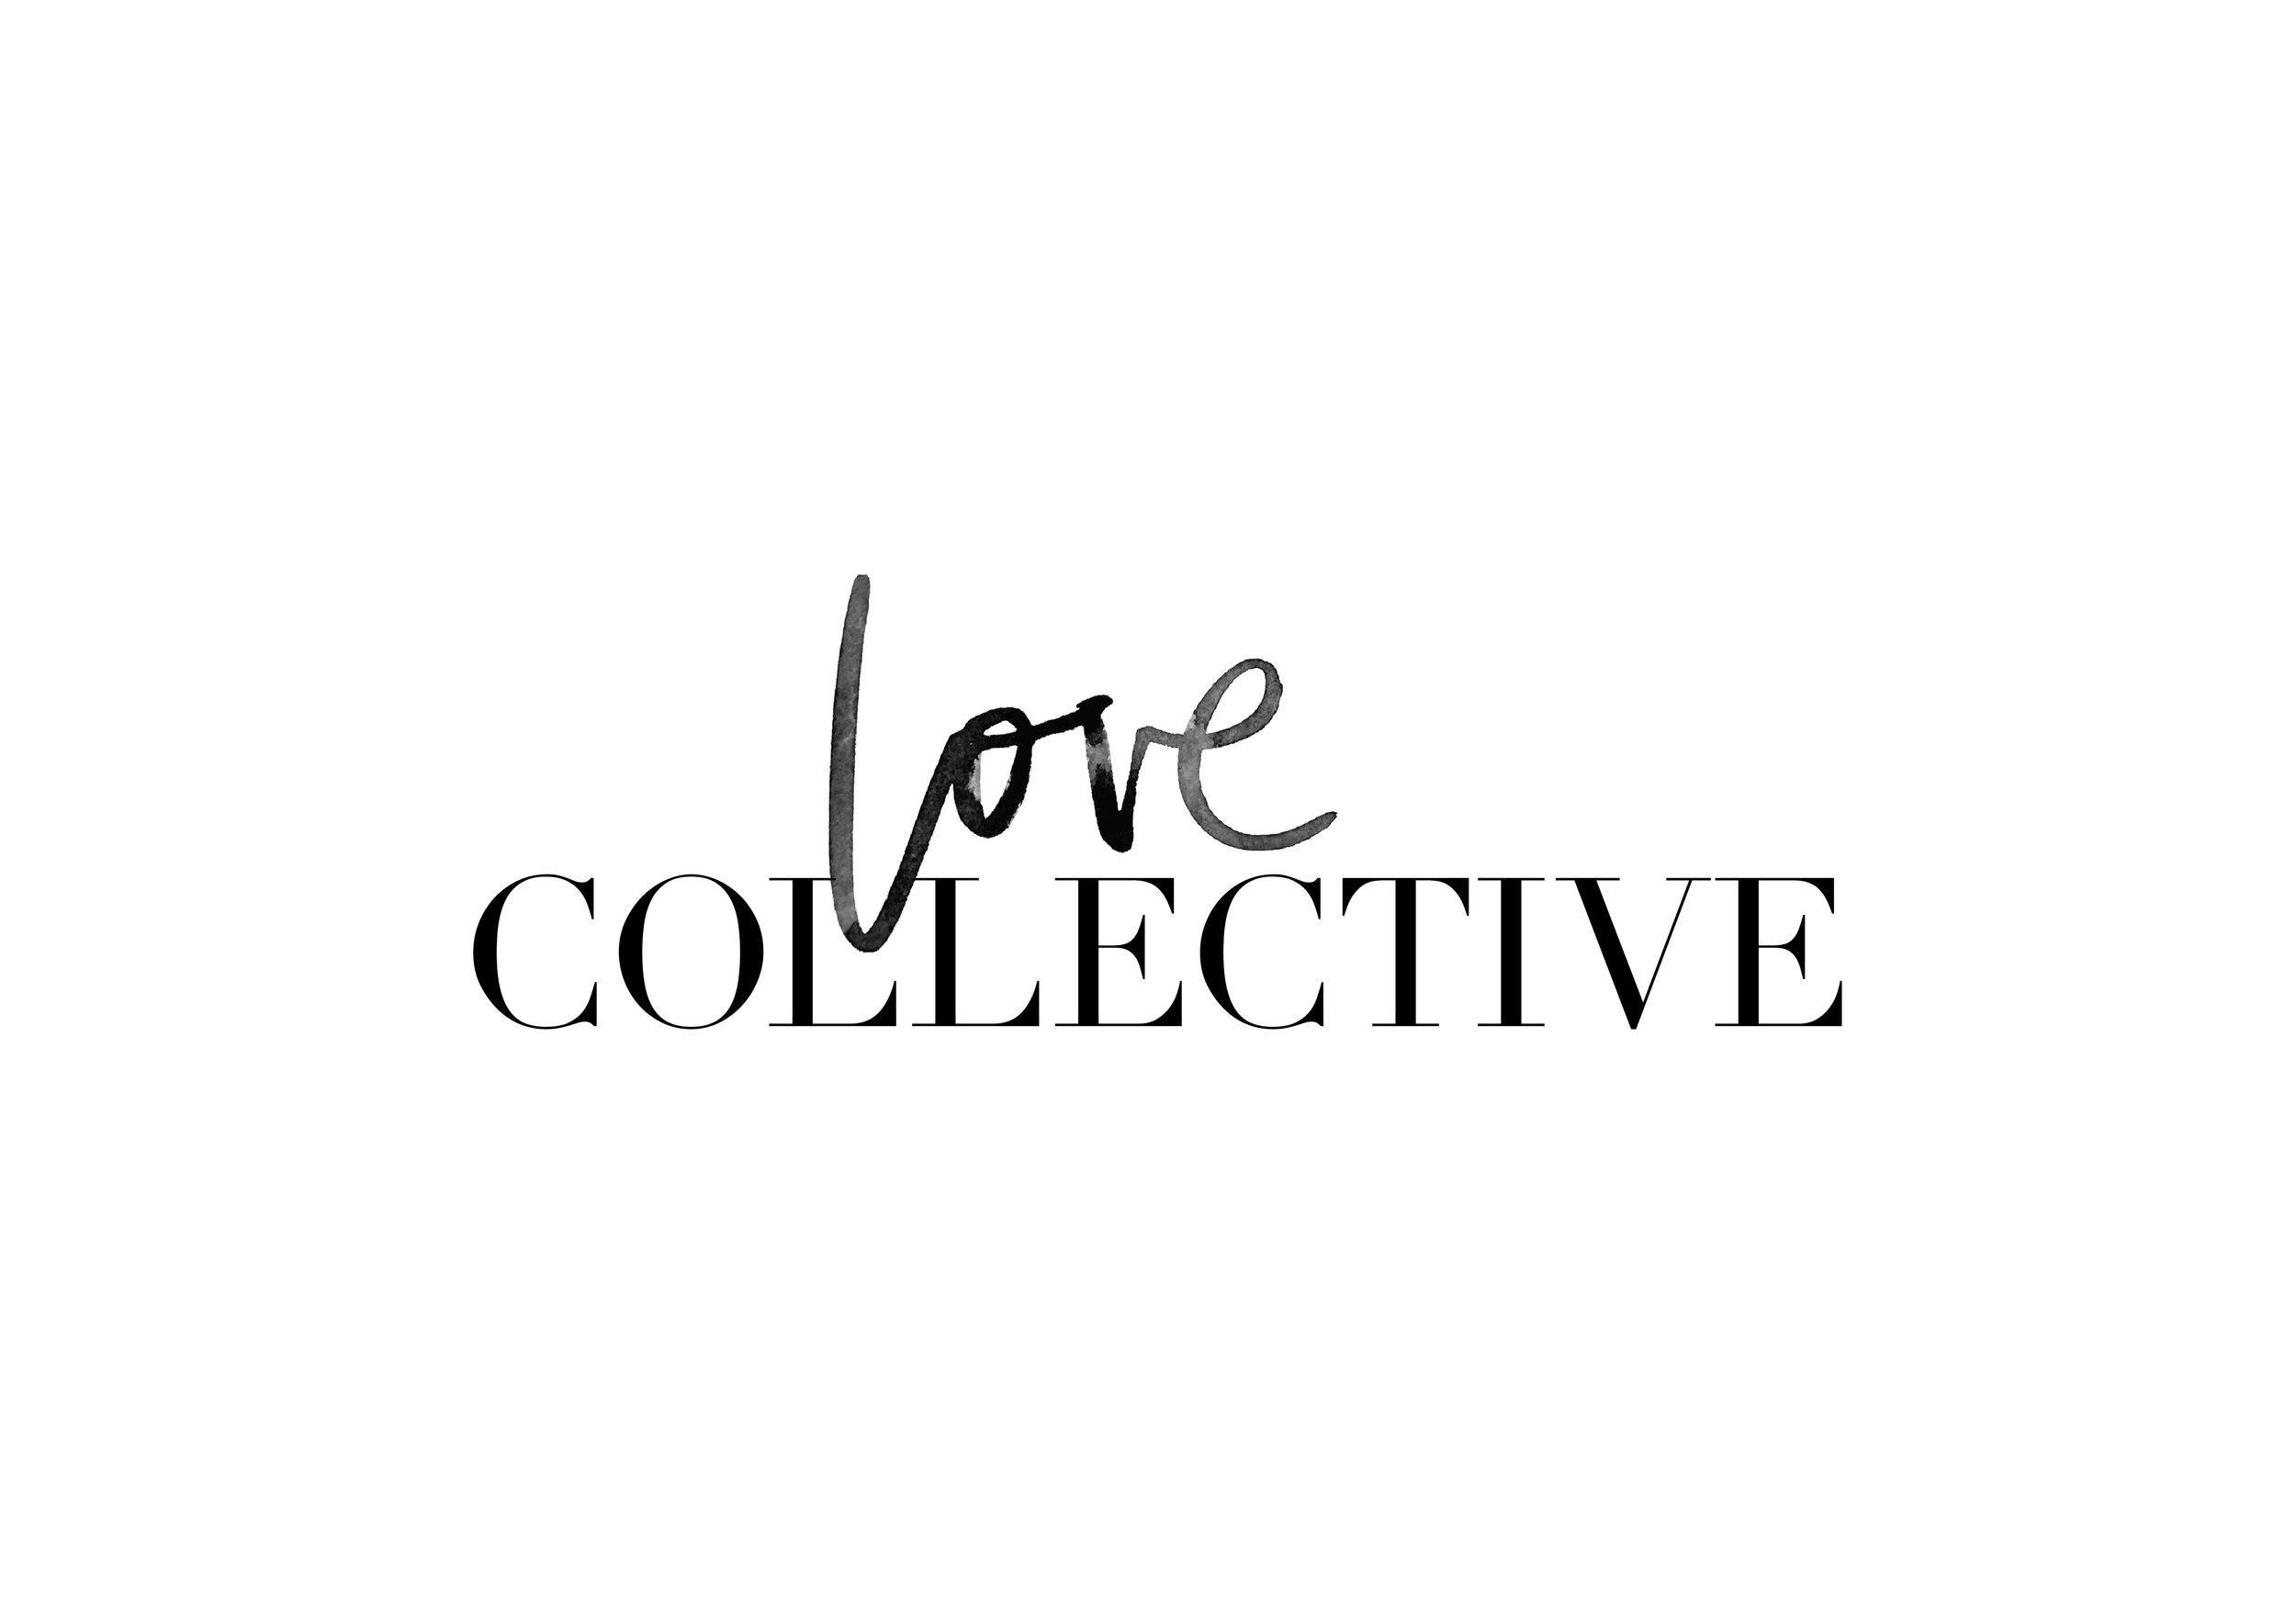 Love_Collective_Grey_Art-01.jpg